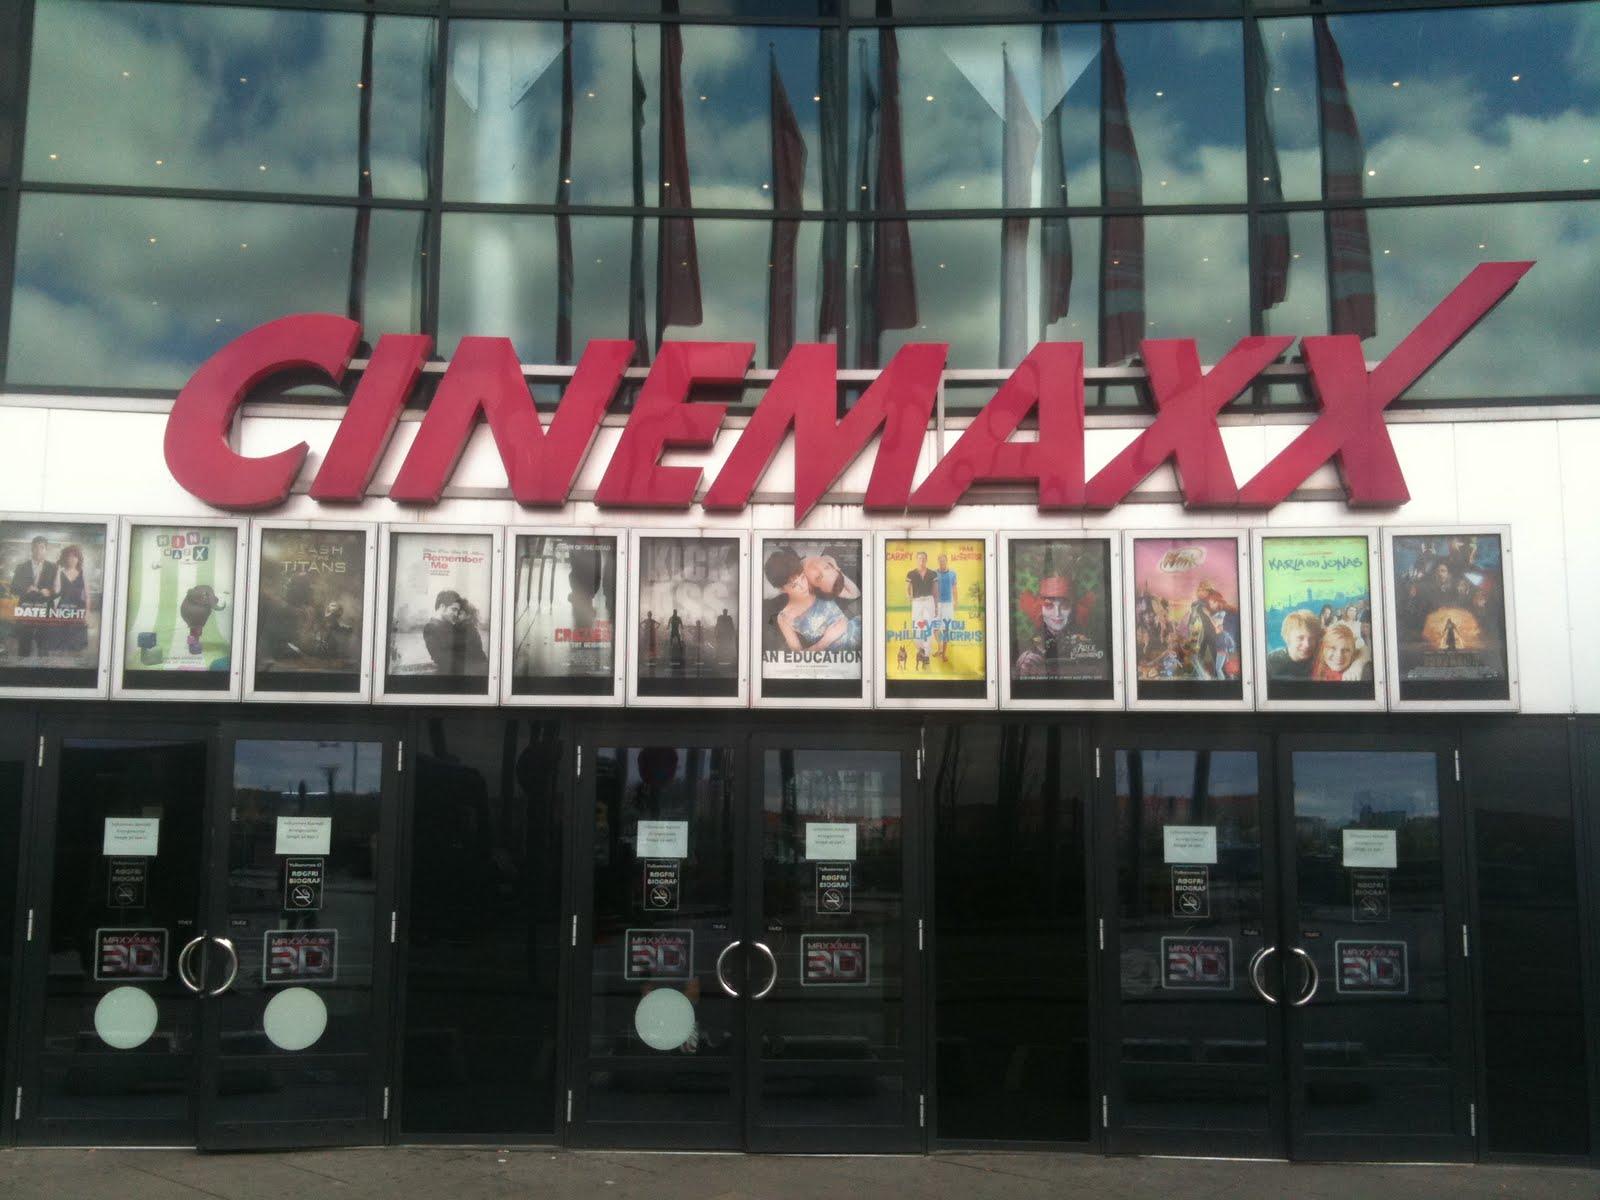 Copenhagen Photo Stories Cinemaxx Cinema At The Fisketorvet